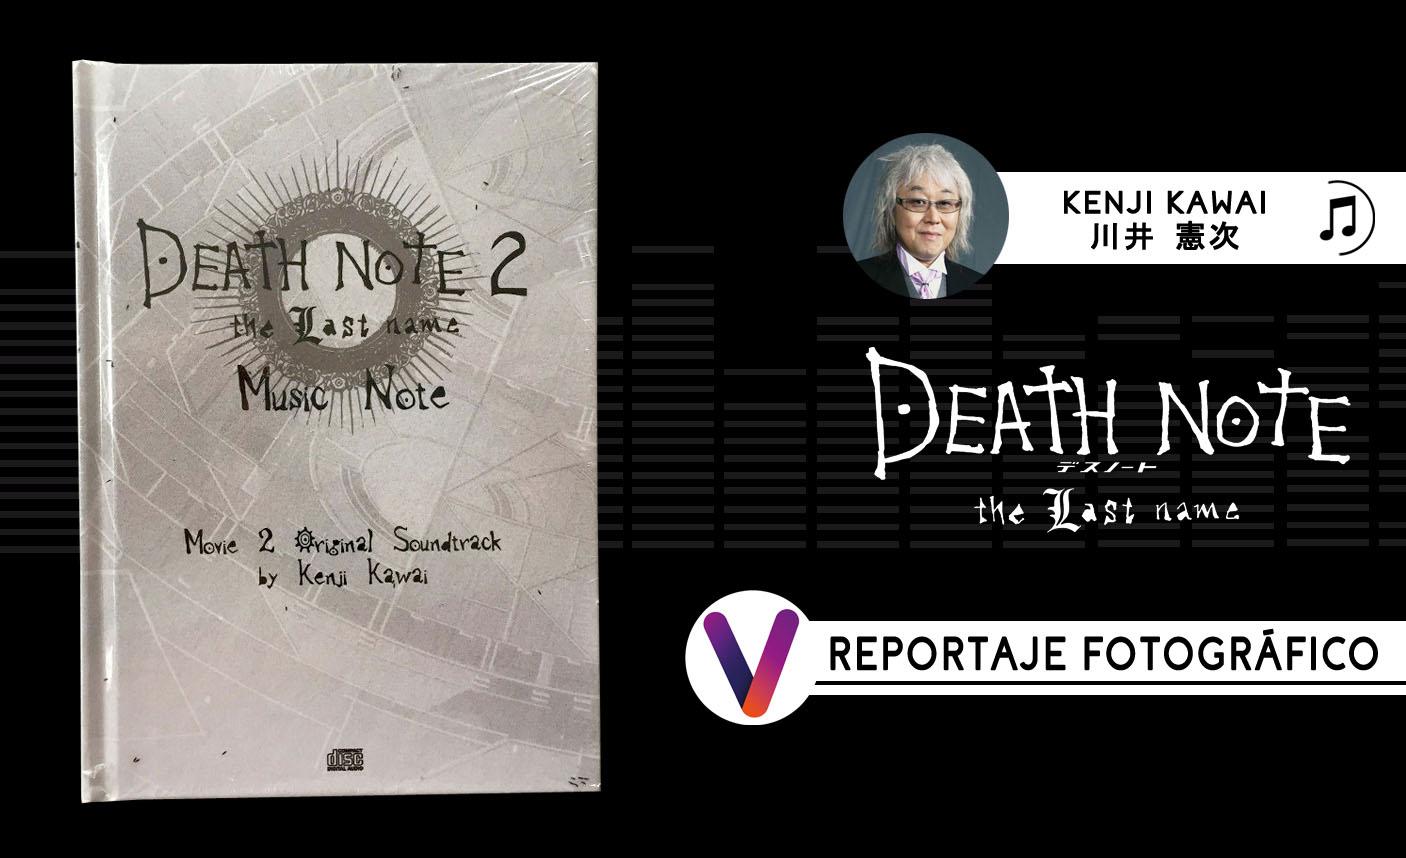 death-note-2-soundt-repor-baner.jpg